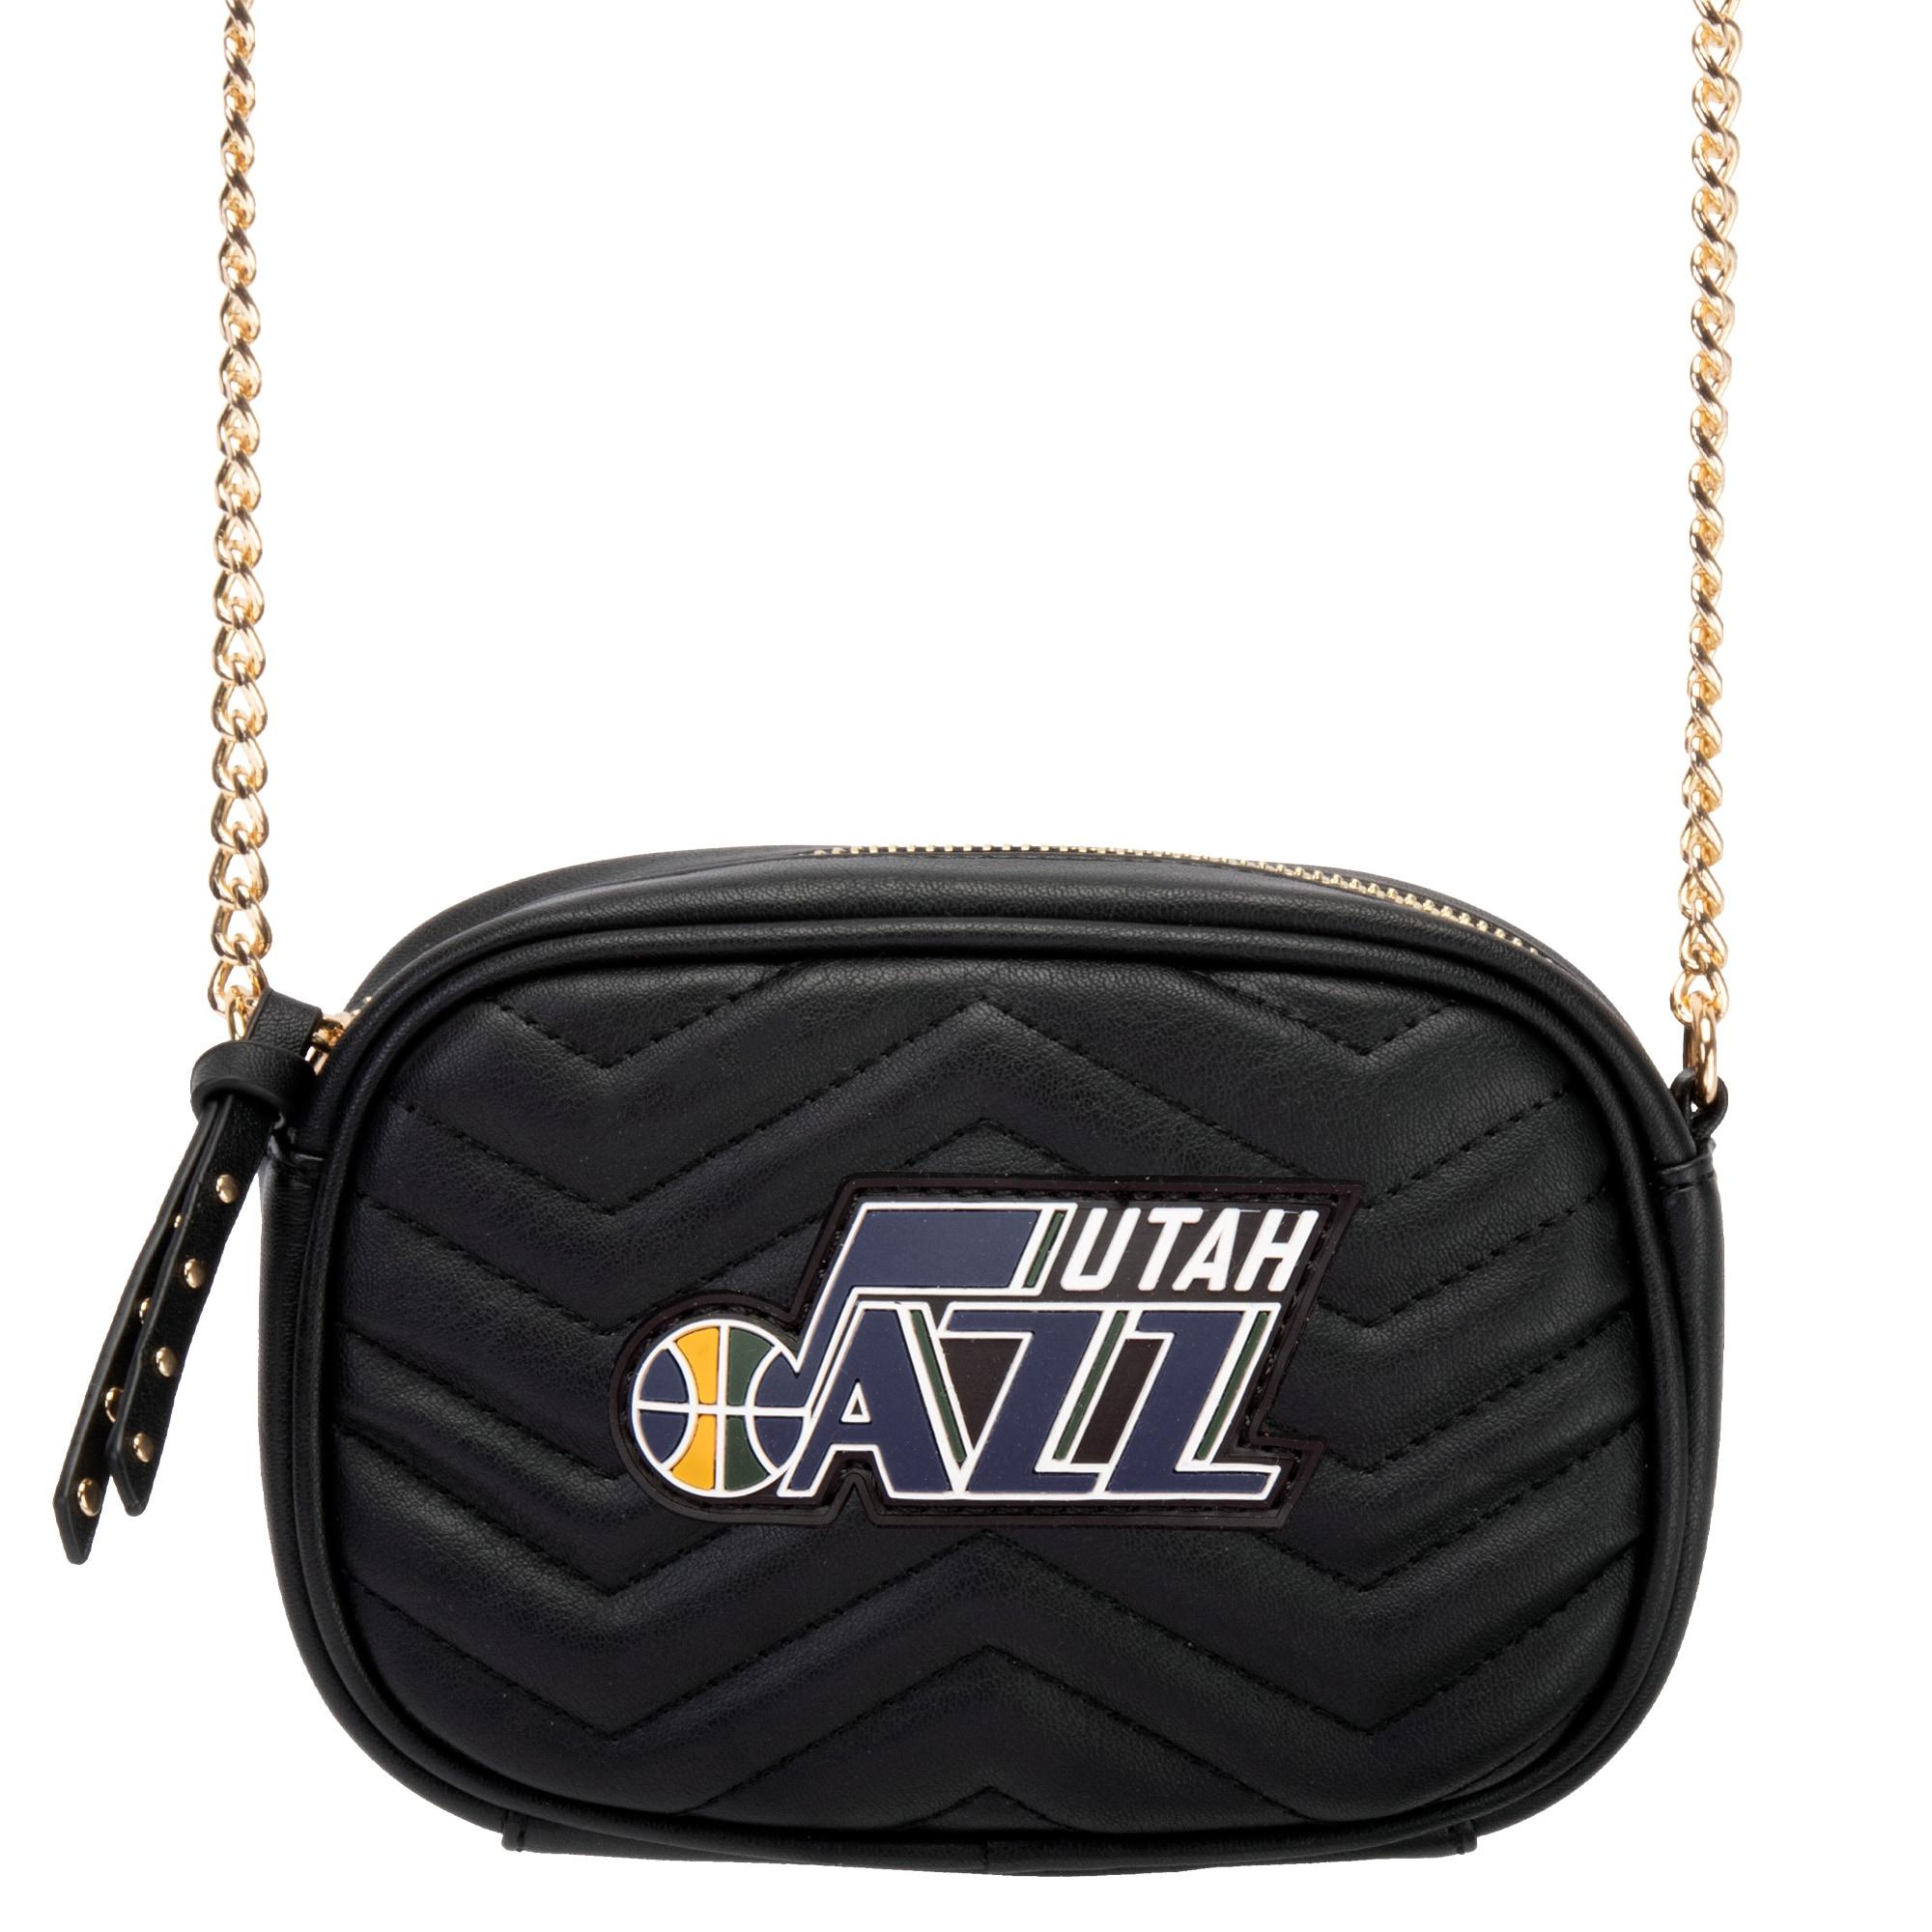 Utah Jazz Women's Crossbody Bag - Black